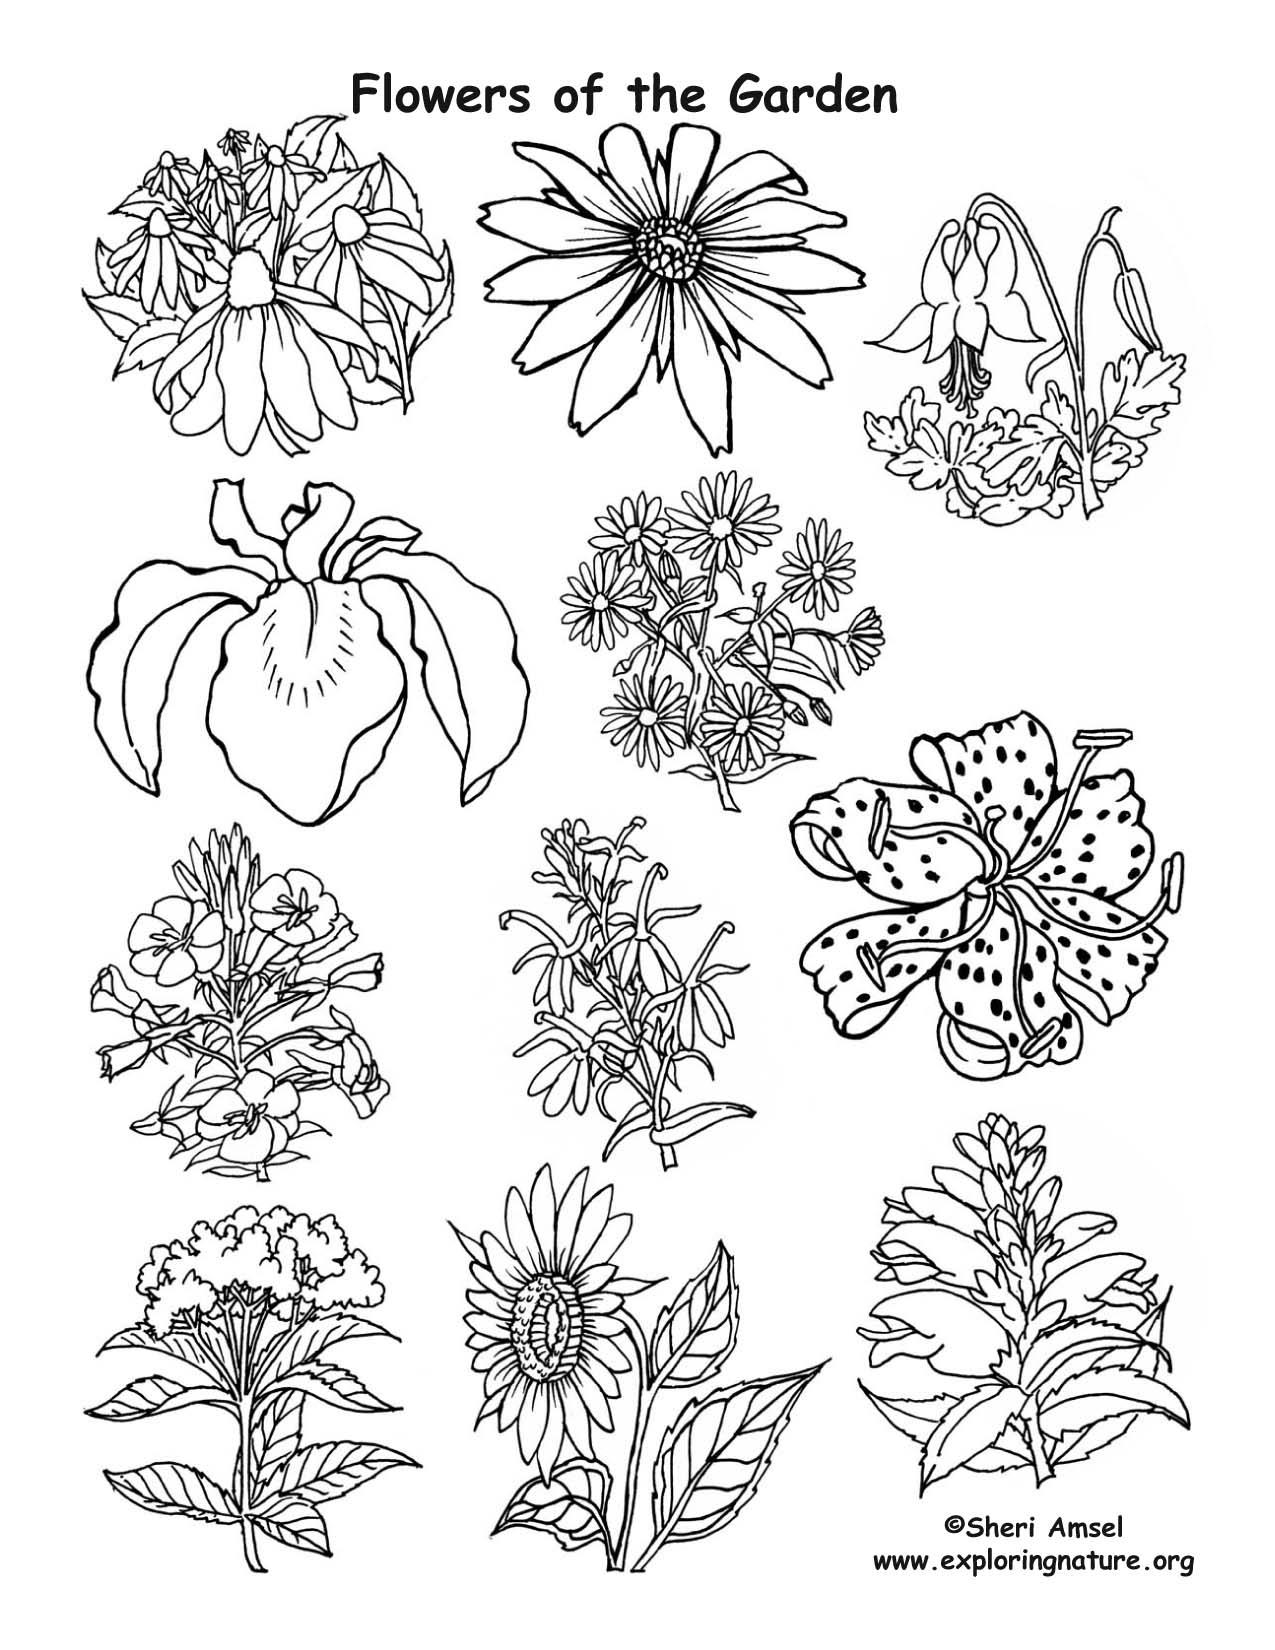 Flowers of the Garden, flower garden